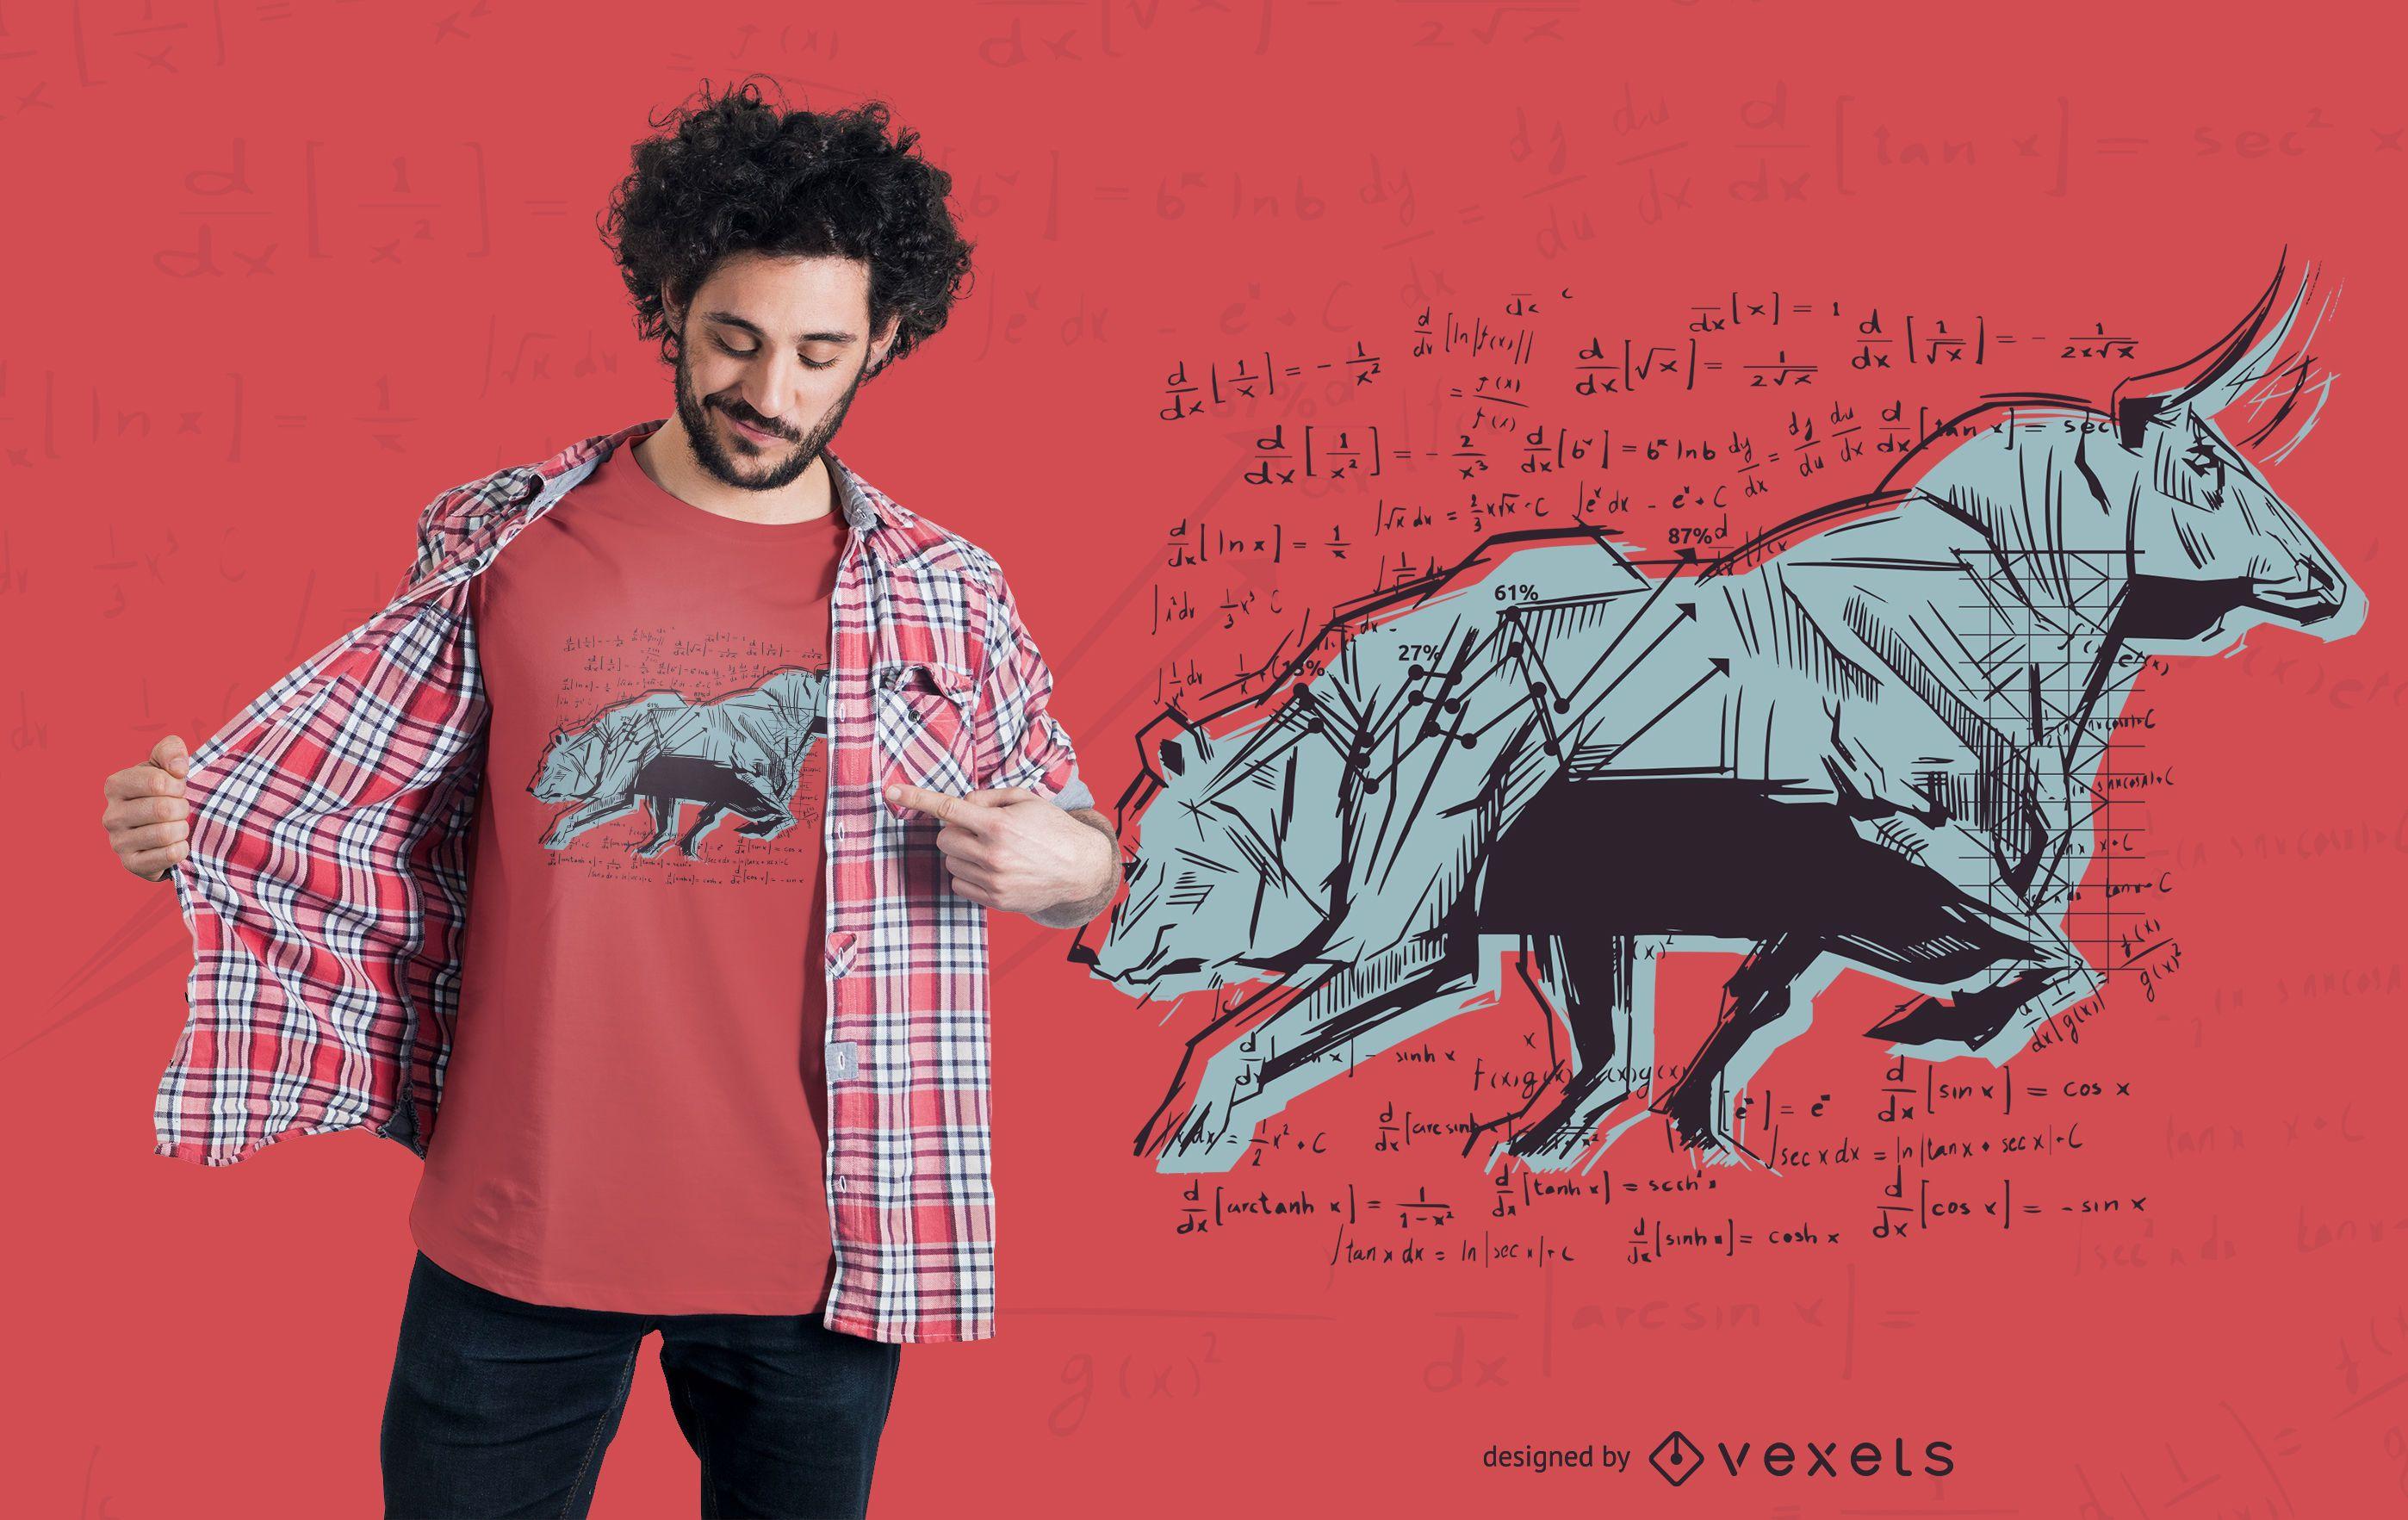 Stock market t-shirt design